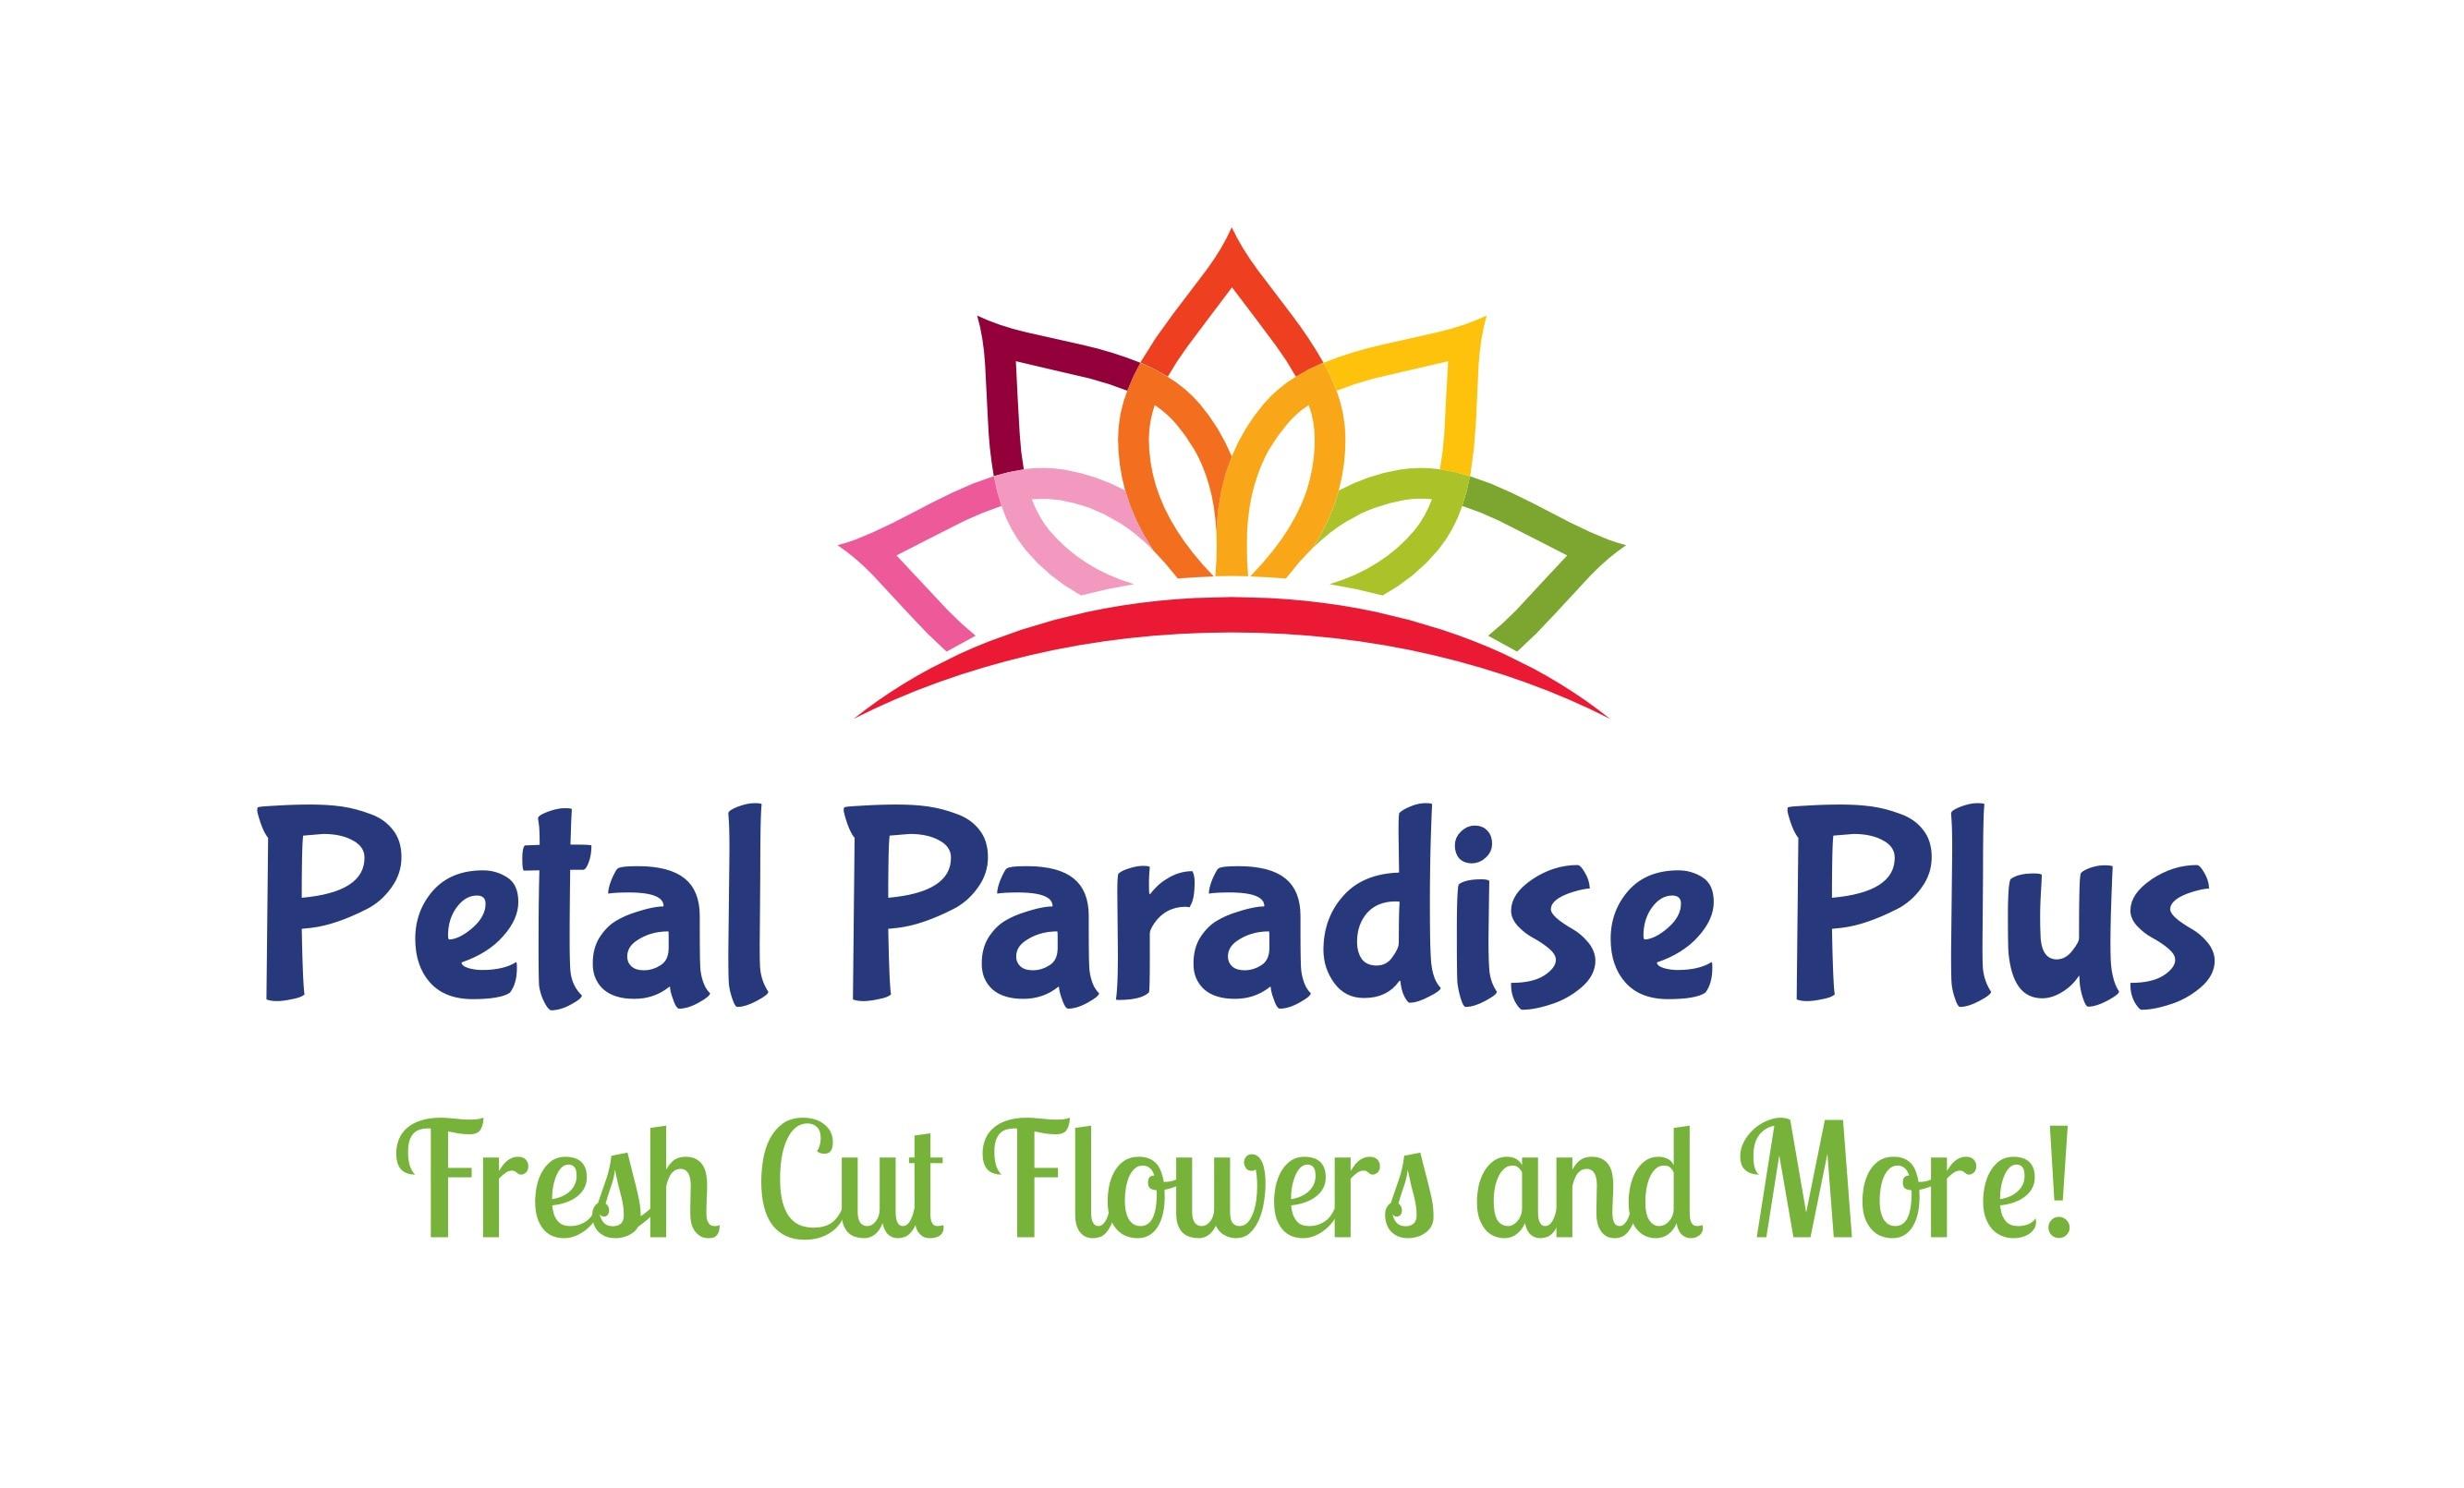 Petal Paradise Plus